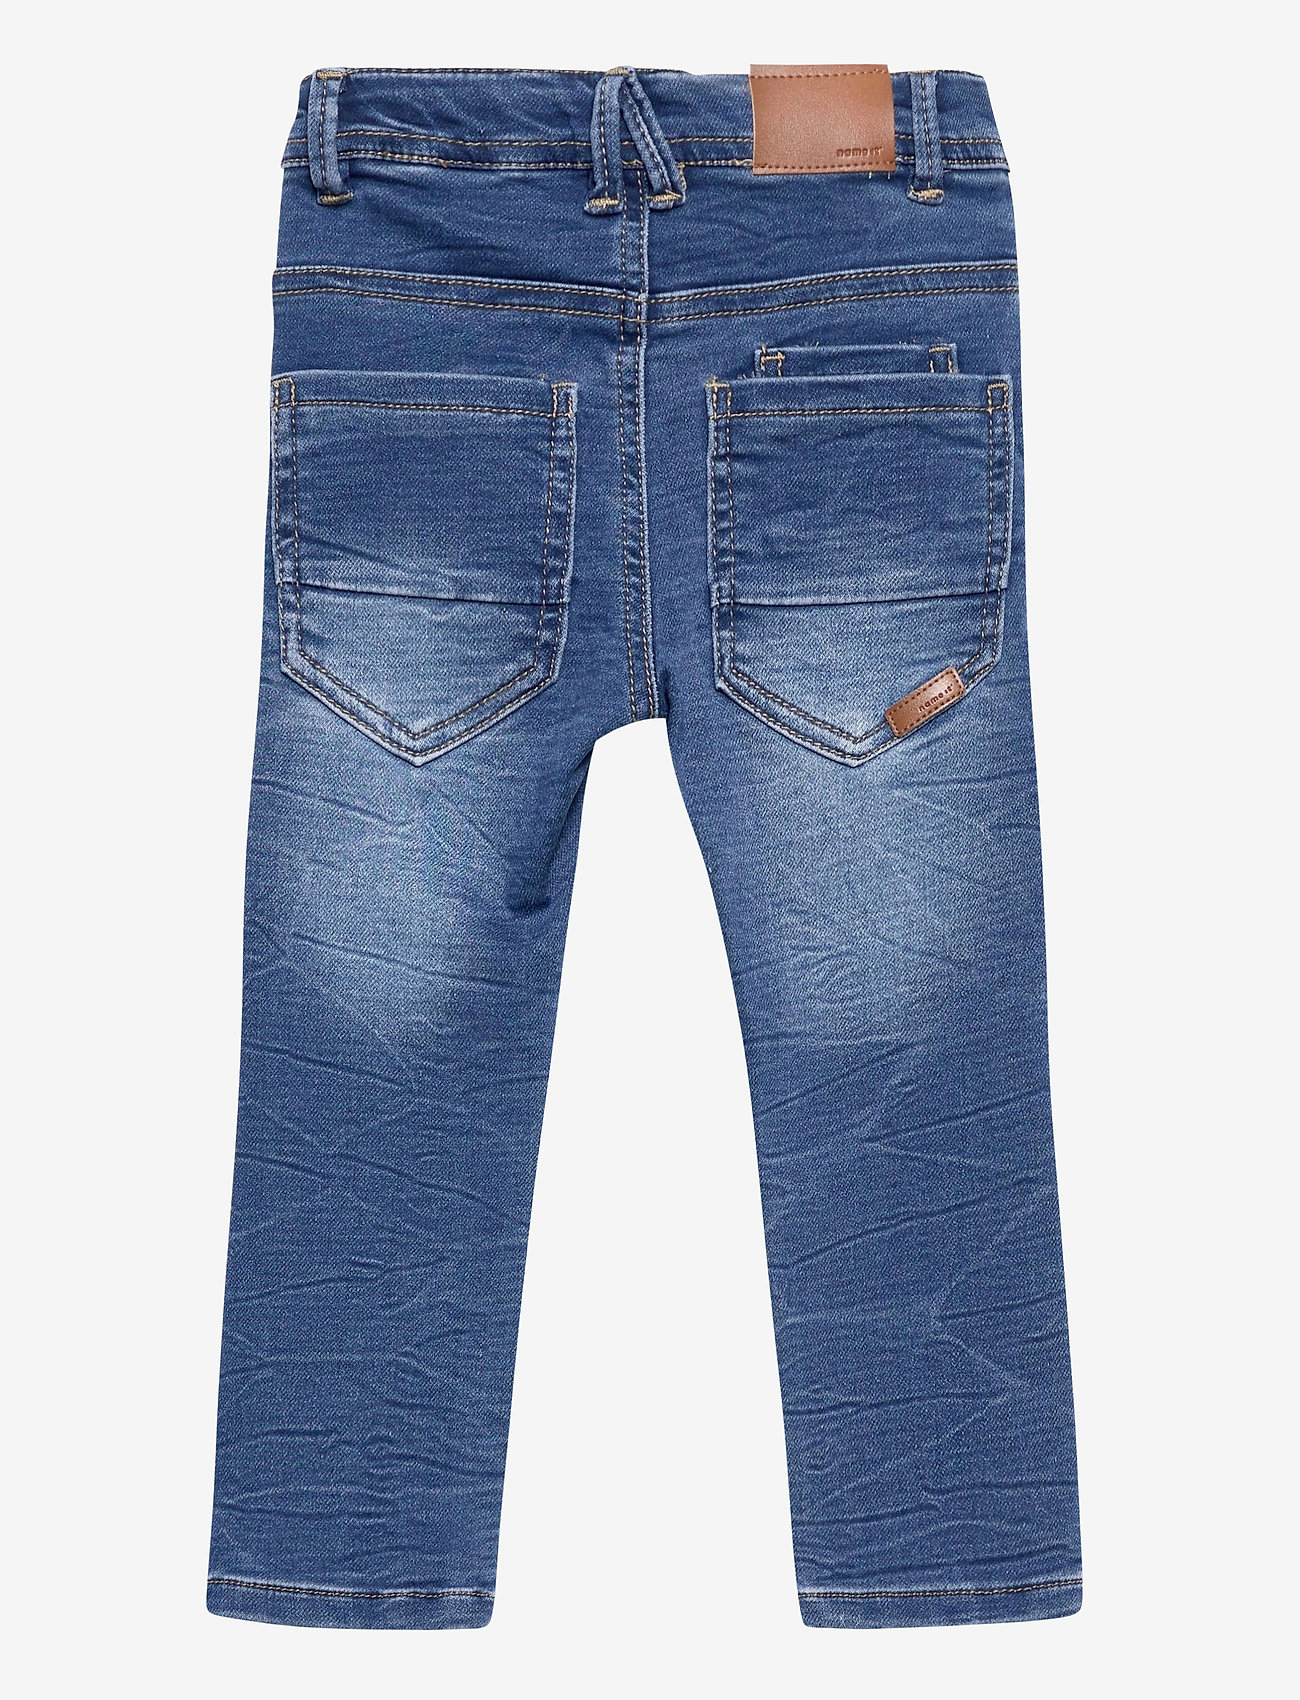 name it - NMMTHEO DNMTOBOS 2458 SWE PANT NOOS - jeans - medium blue denim - 1